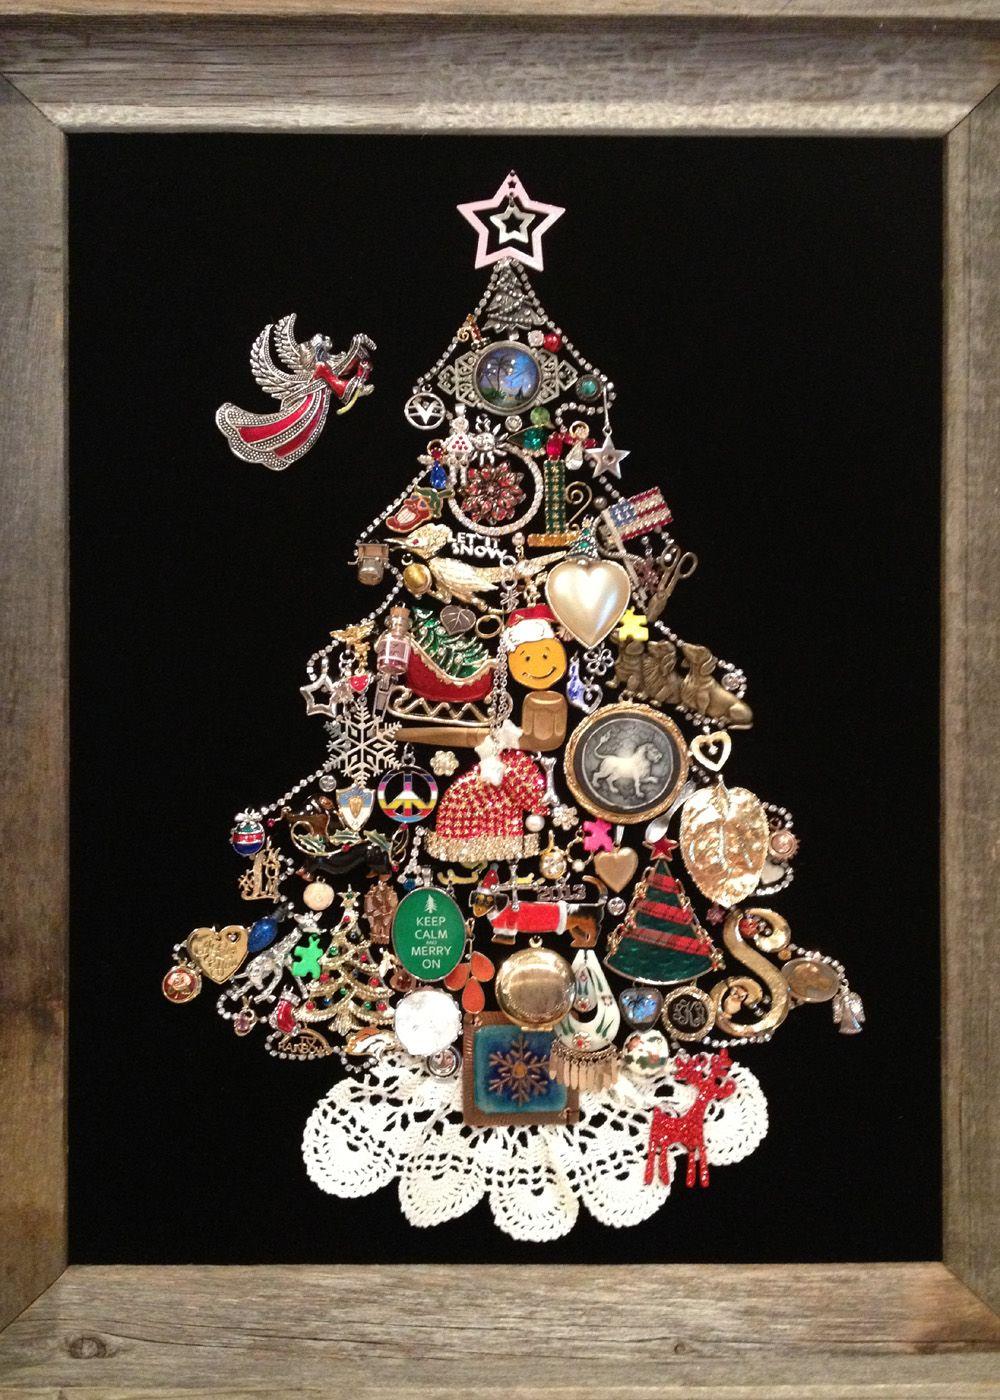 Jewel Christmas Tree, my grandma had one of these\